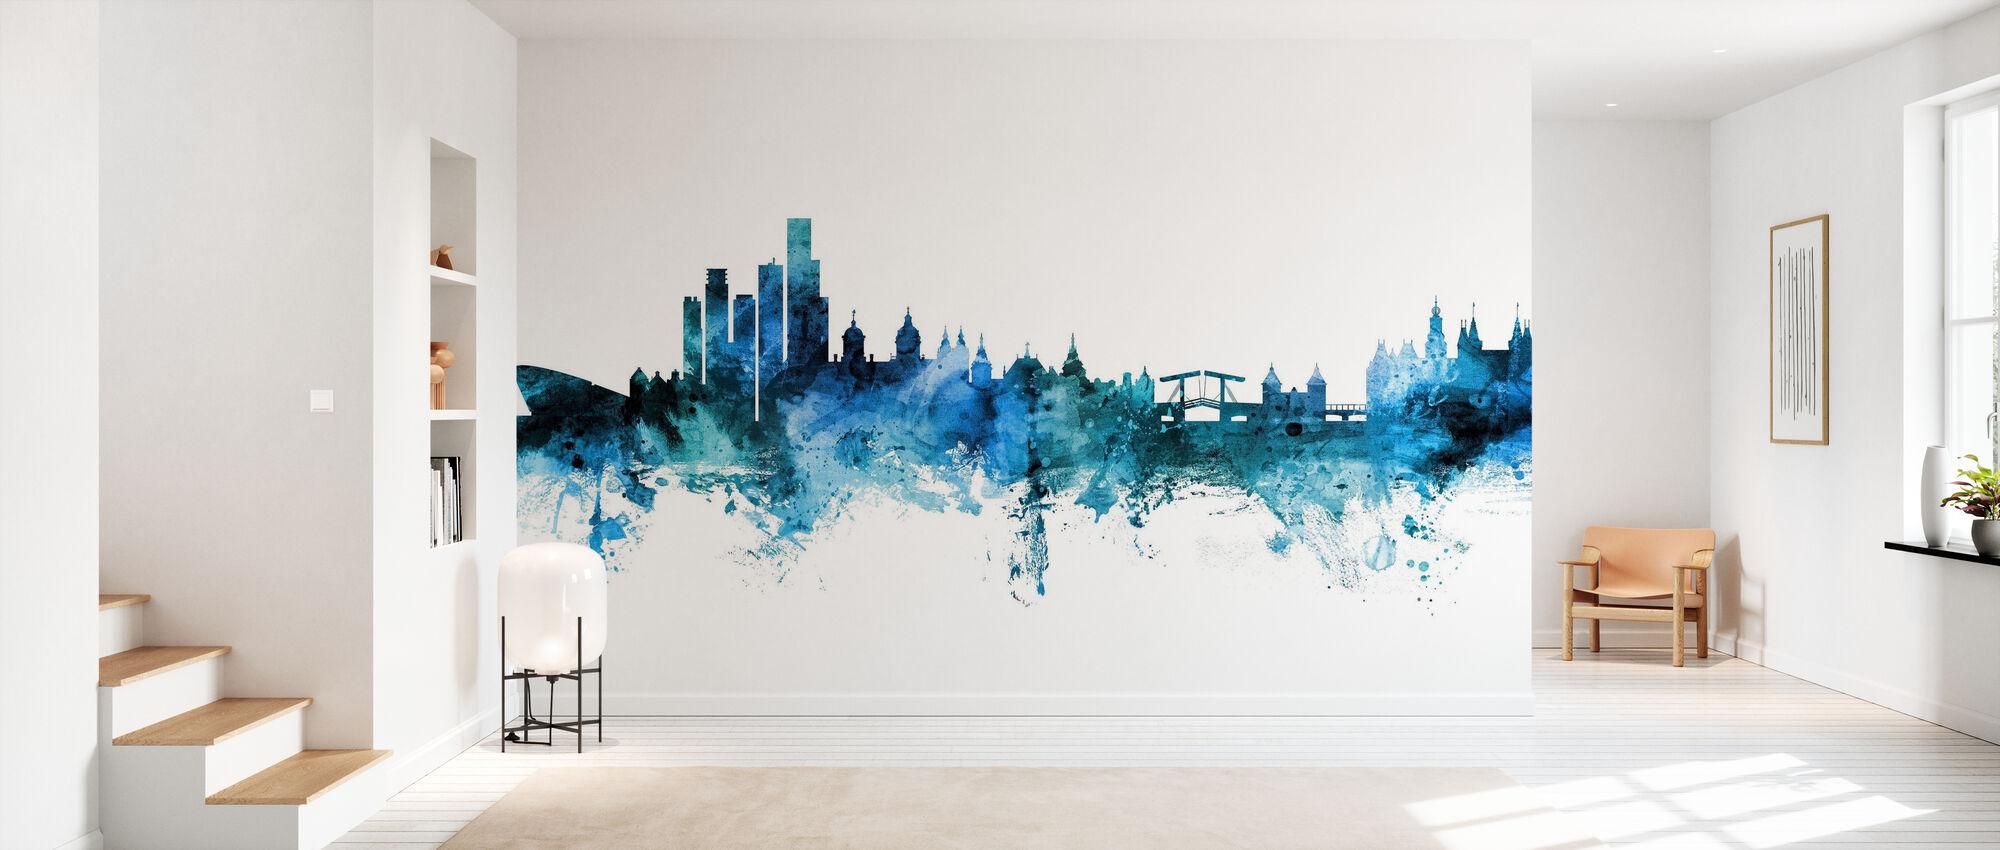 Amsterdam The Netherlands Skyline - Wallpaper - Hallway